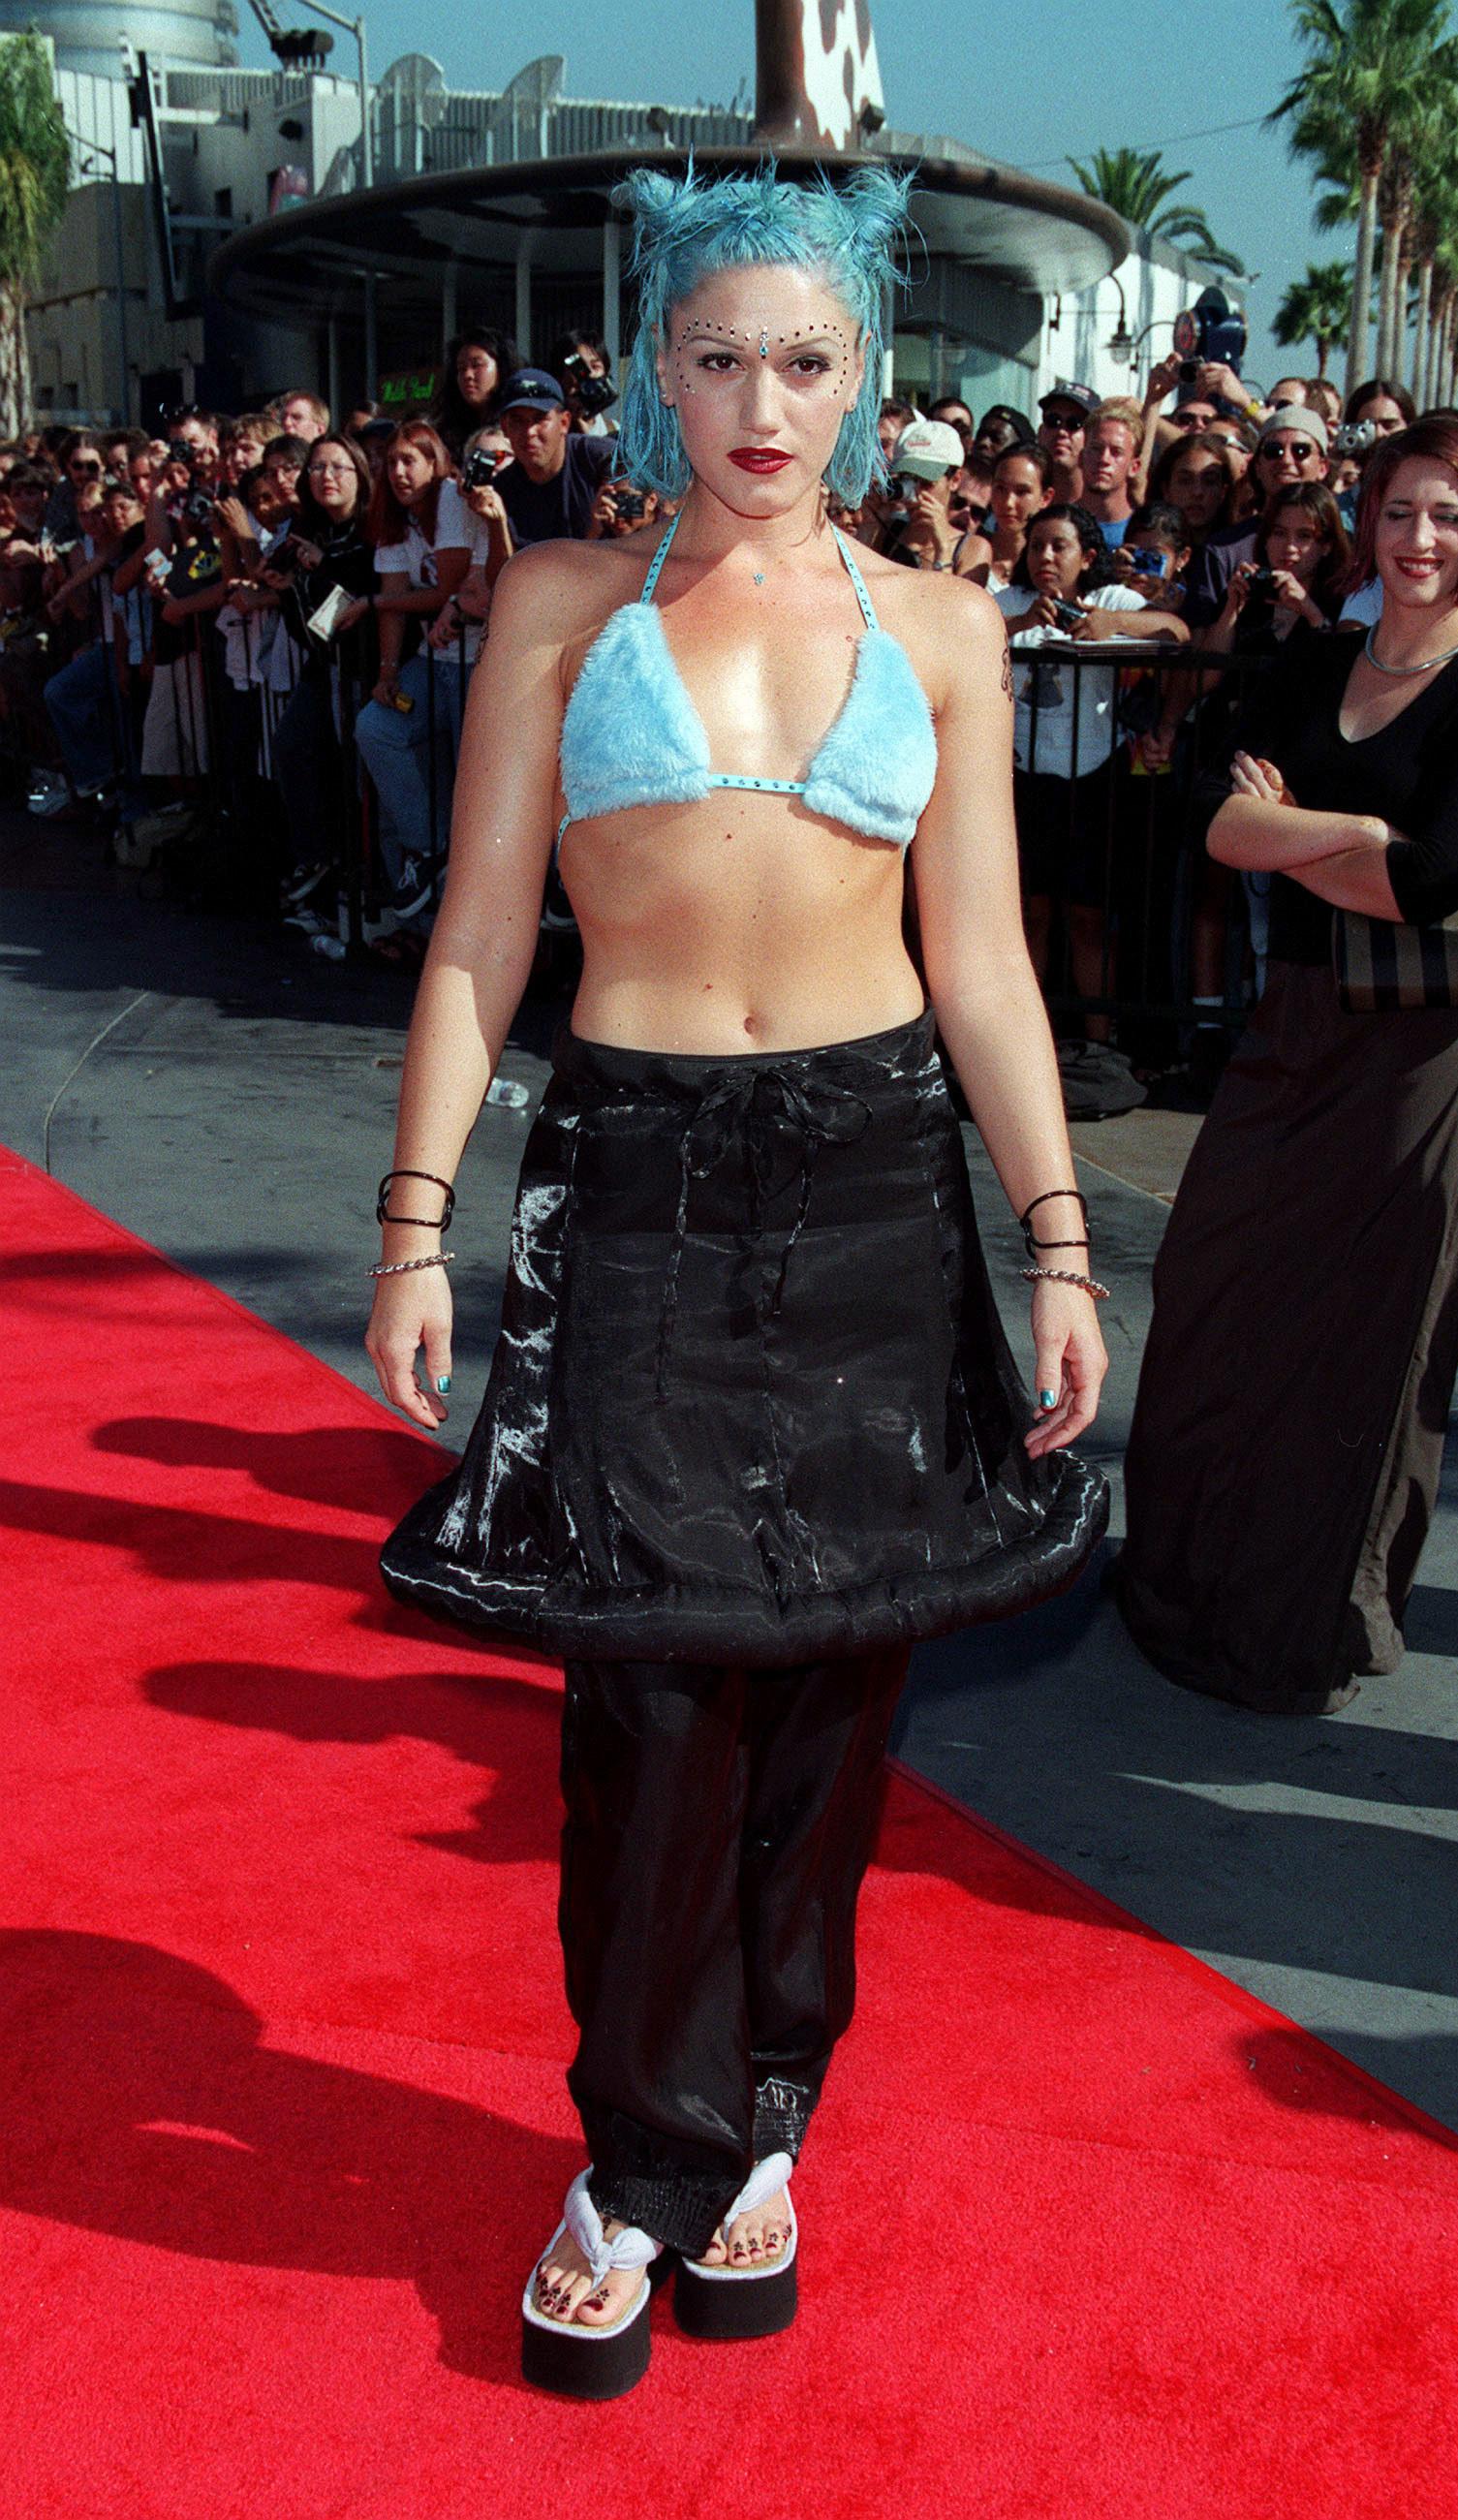 Gwen Stefani at the 1998 Video Music Awards